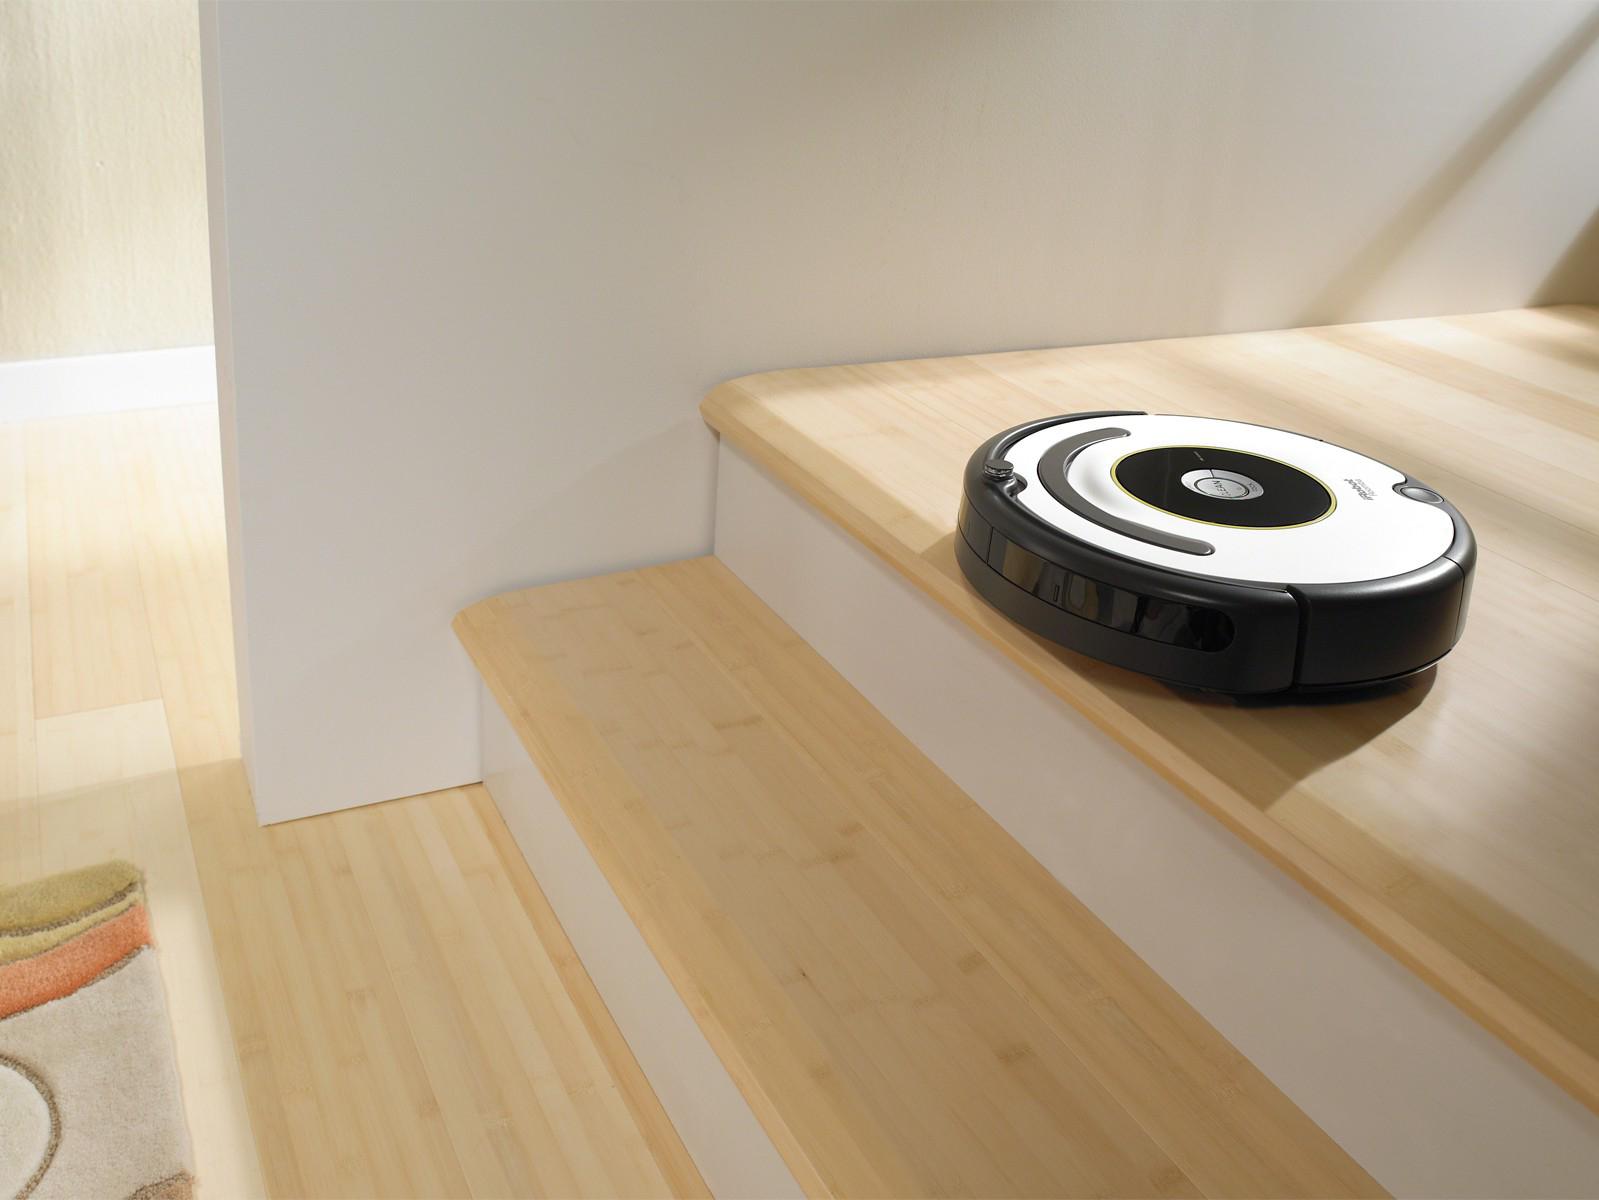 Aspiradora Irobot Roomba 621 Paris # Muebles Cic Camino Melipilla